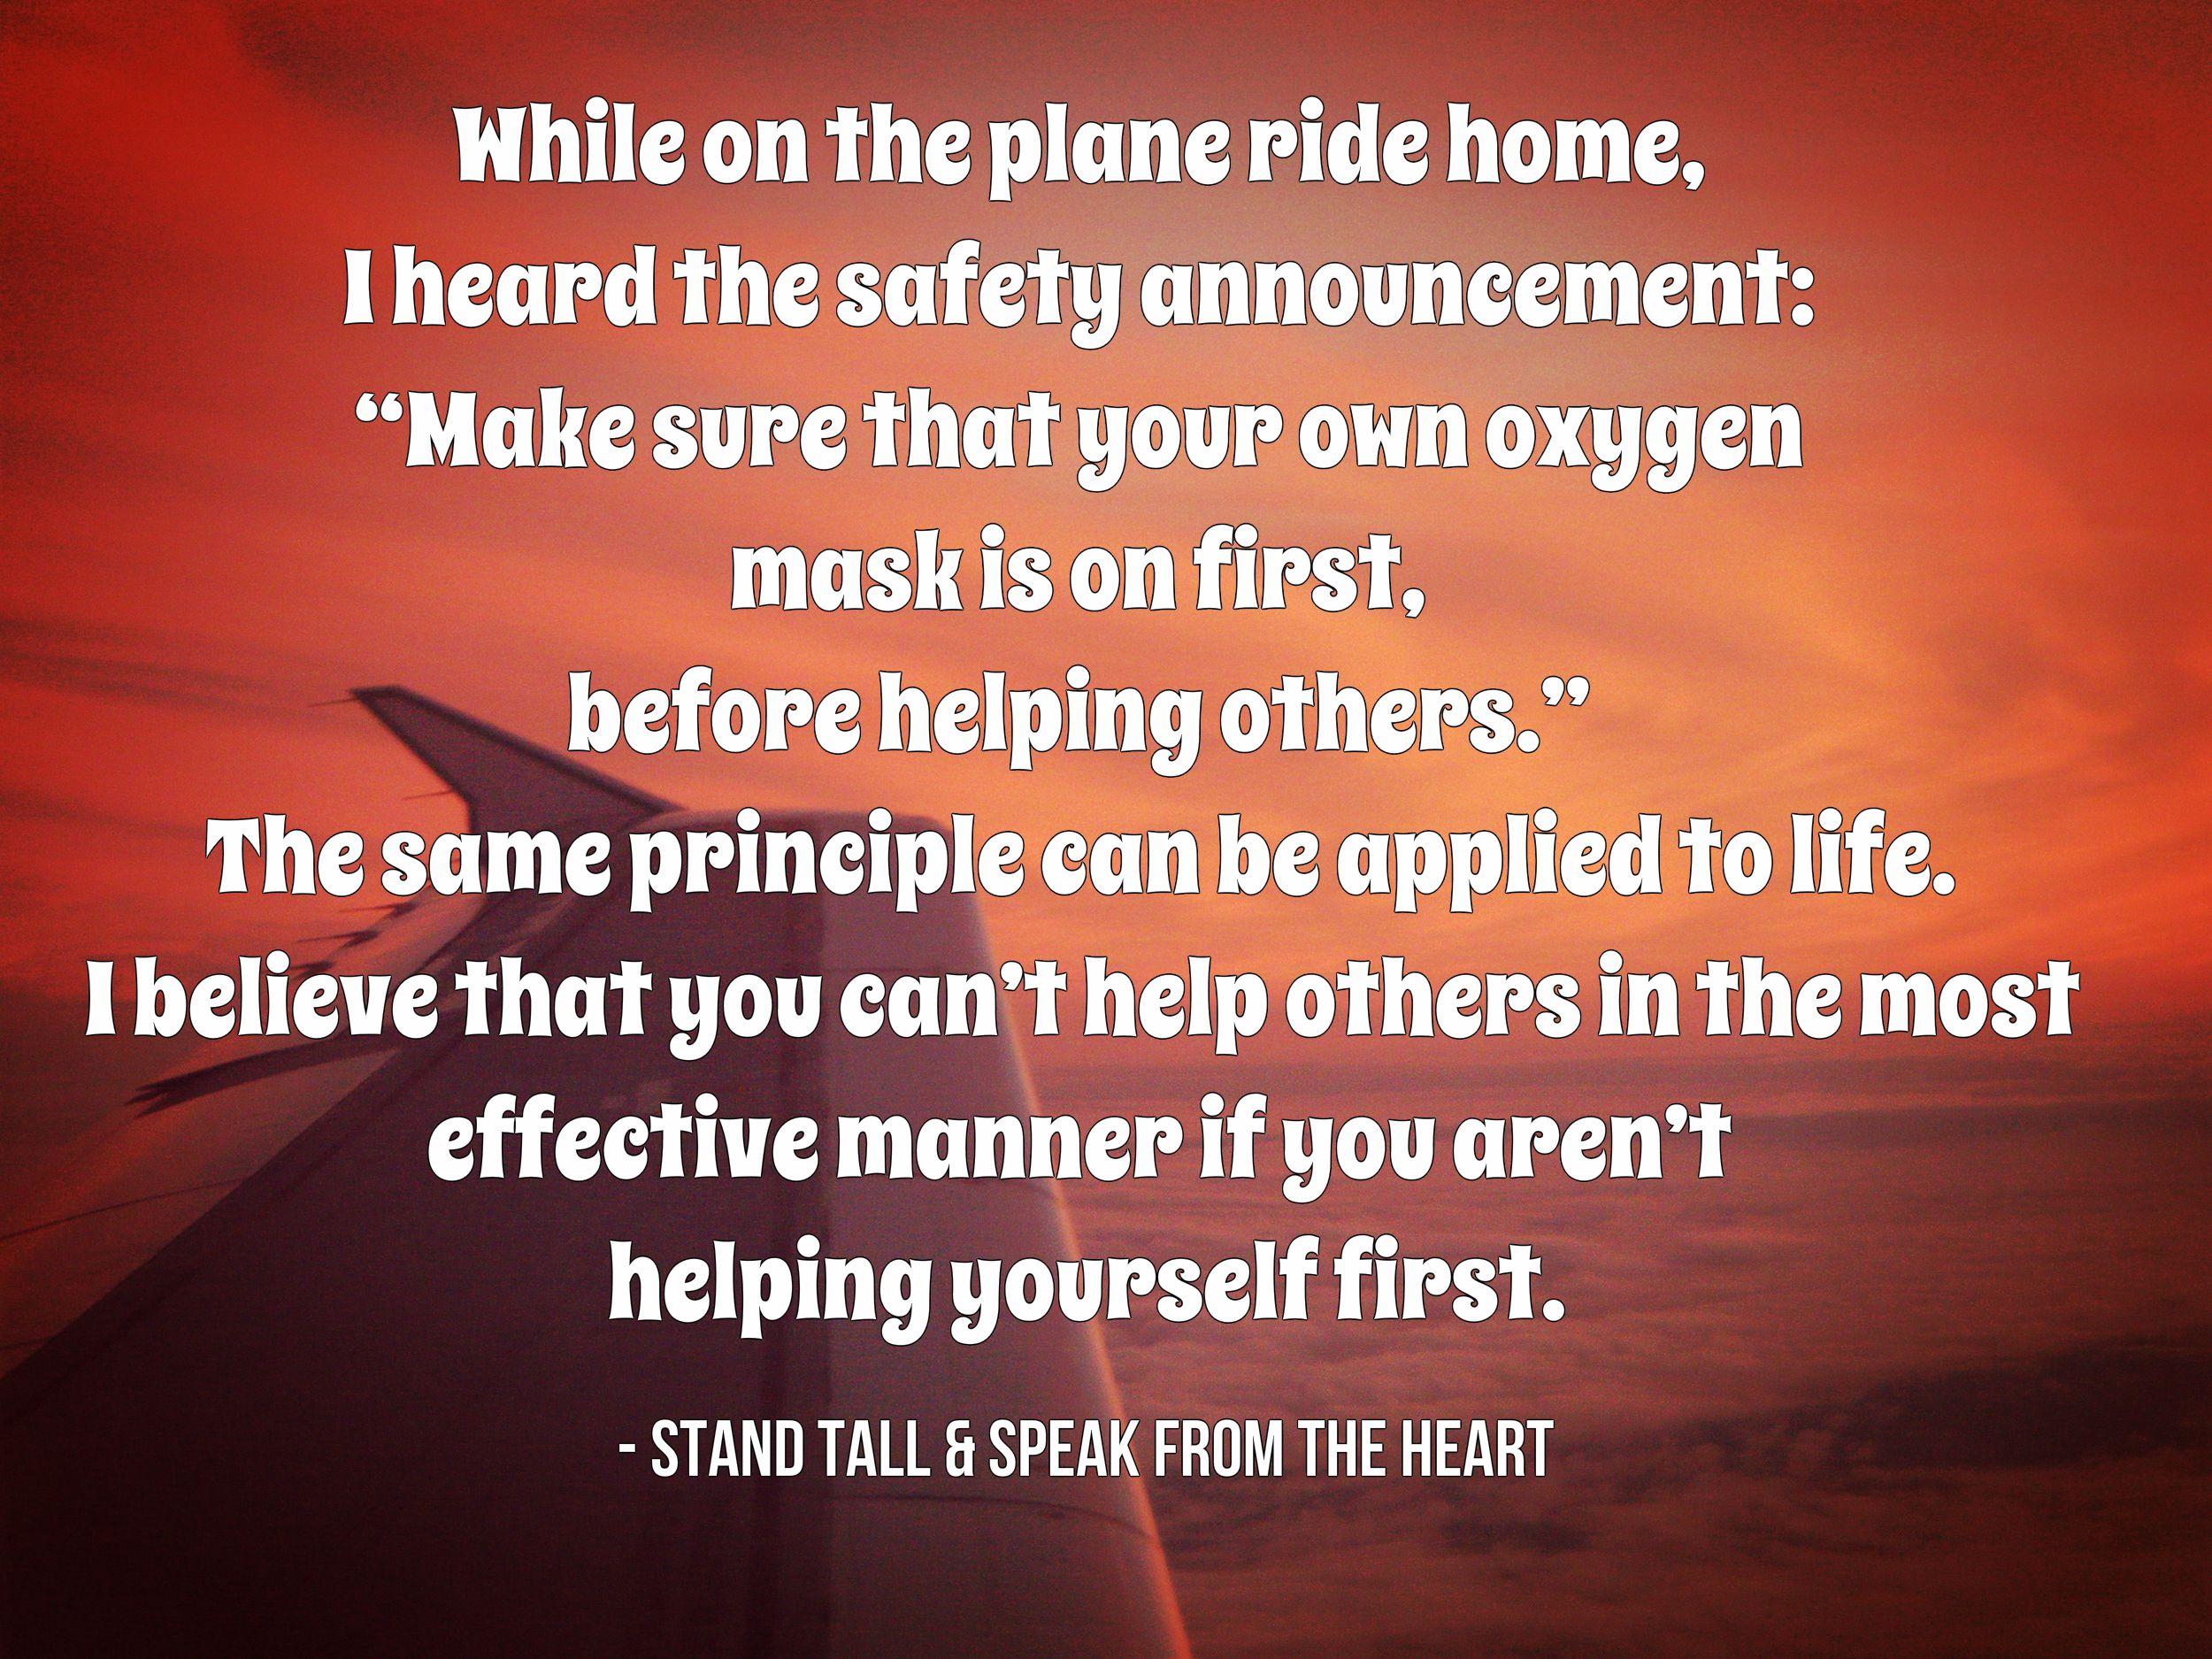 Plane-safety-announcement.jpg